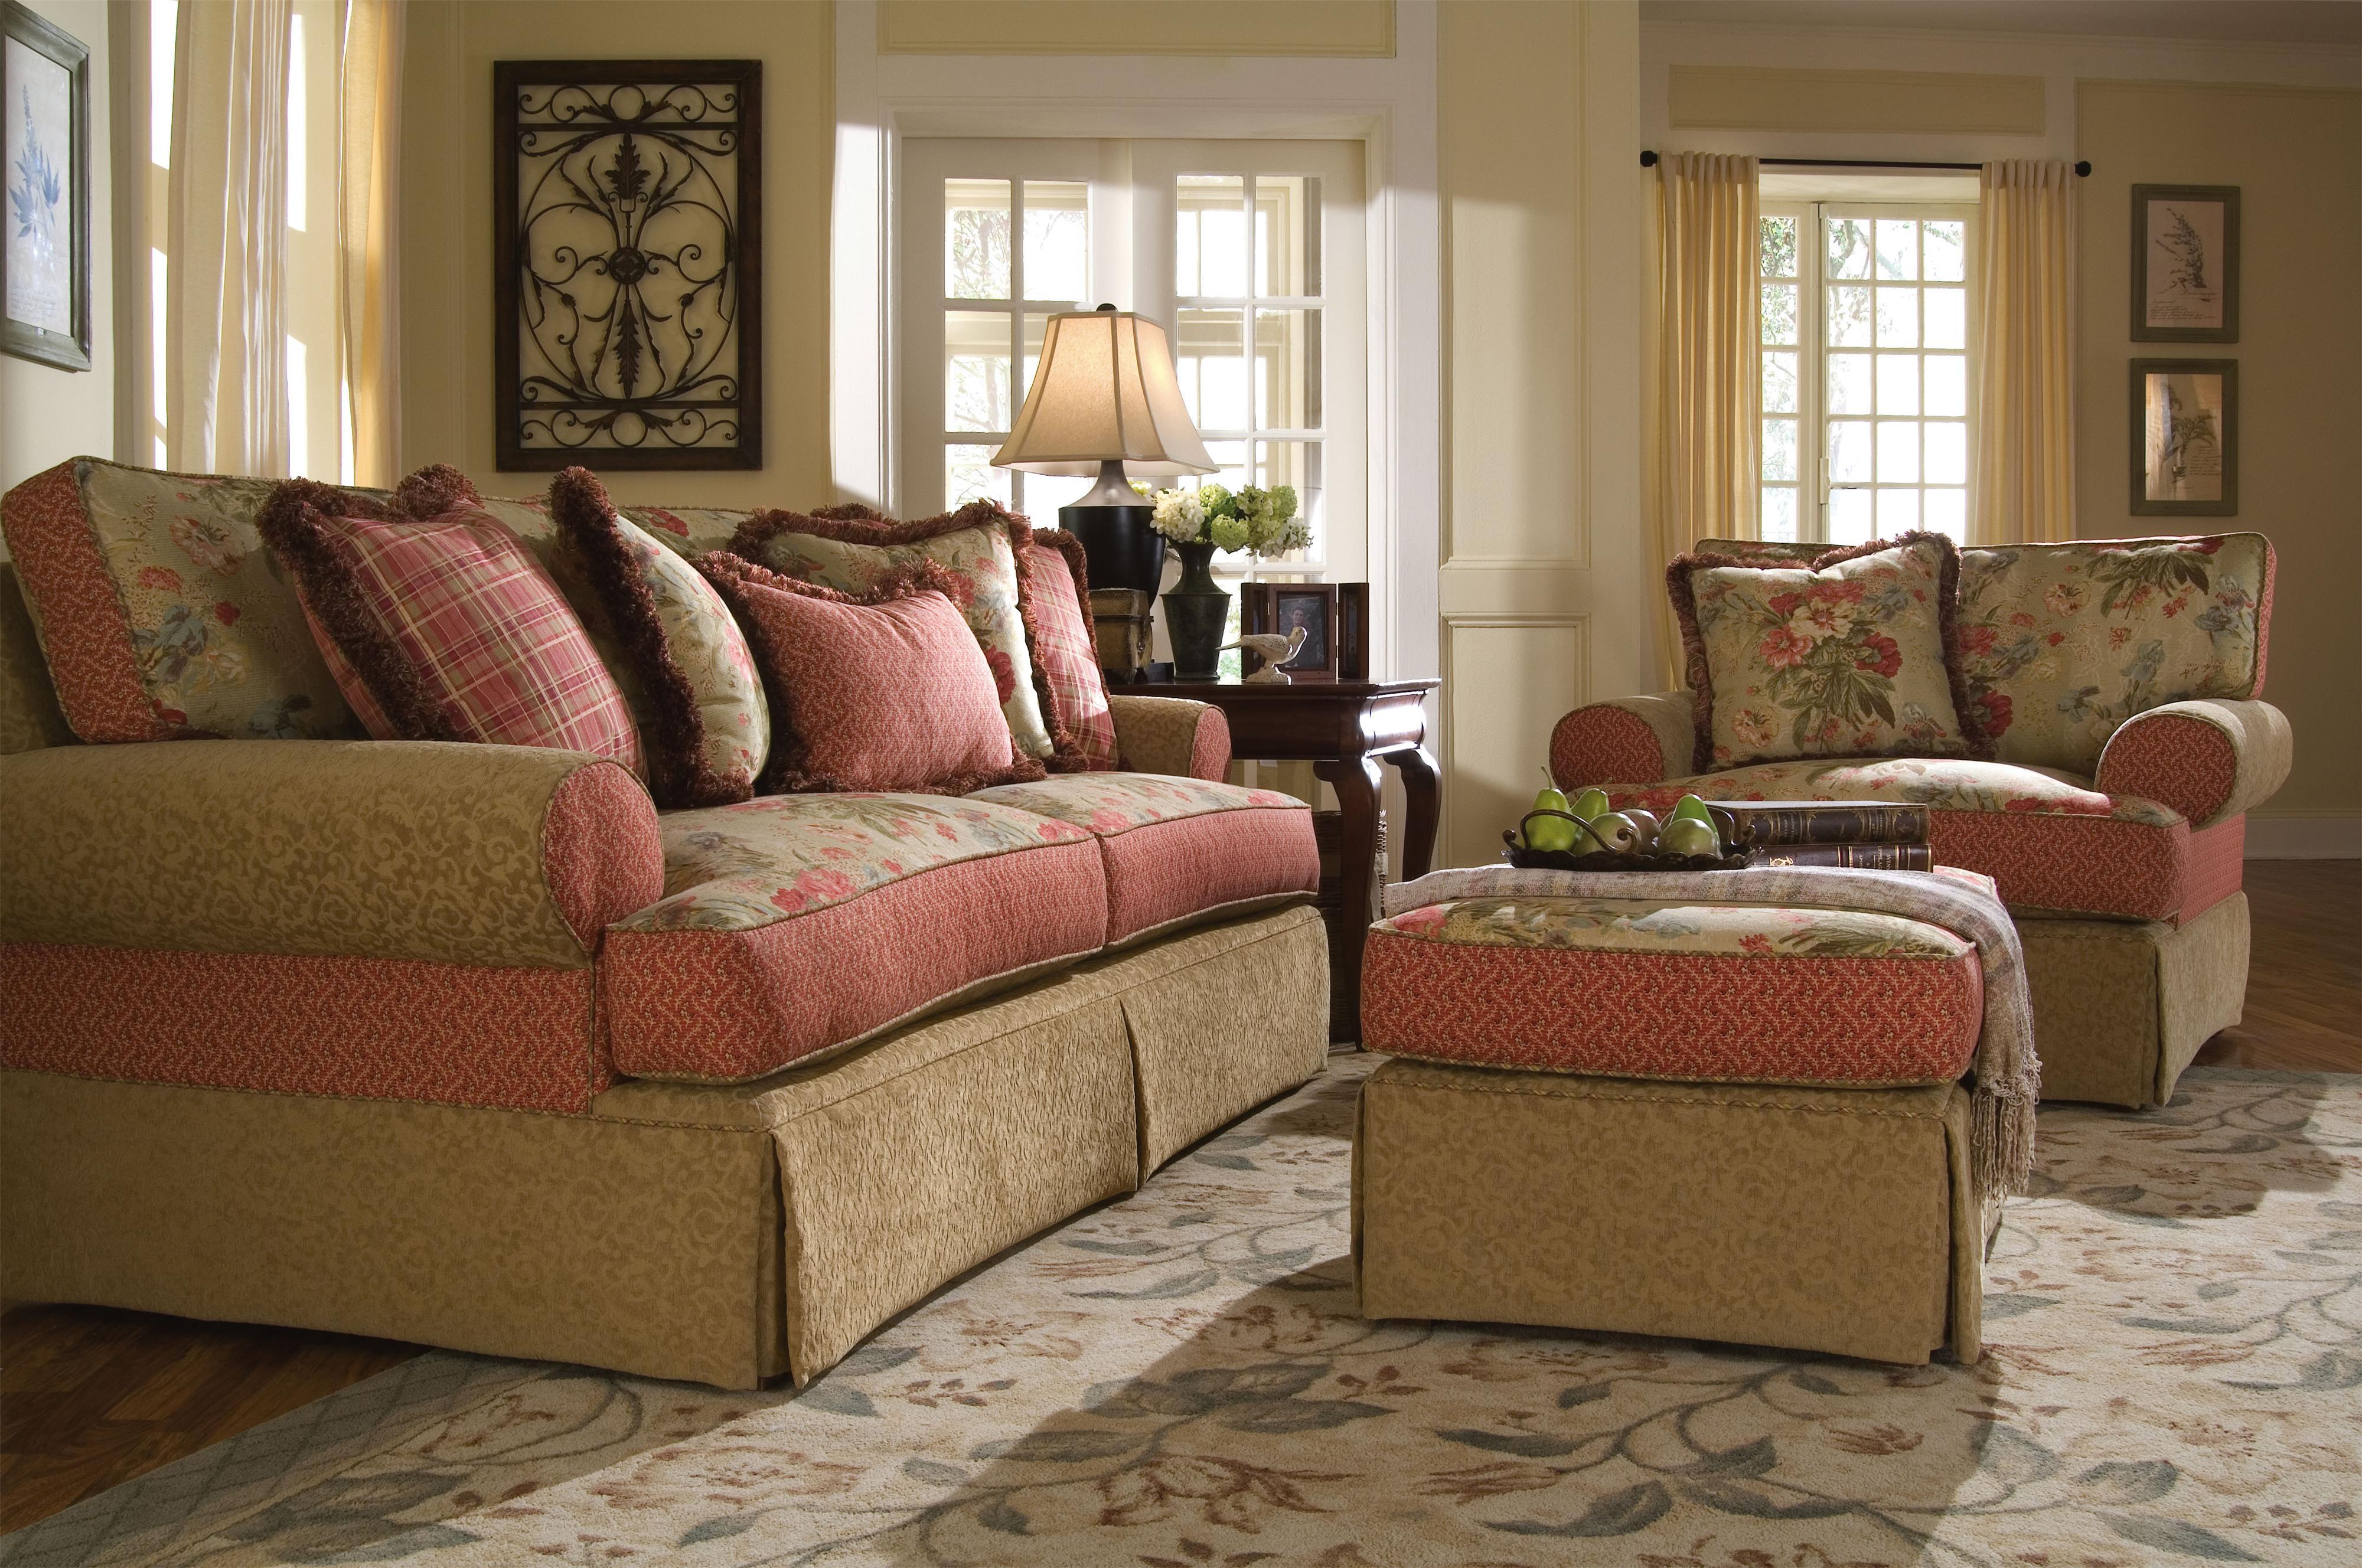 Lovely Kincaid Furniture Malibu Skirted Stationary Sofa   Lindyu0027s Furniture  Company   Sofa